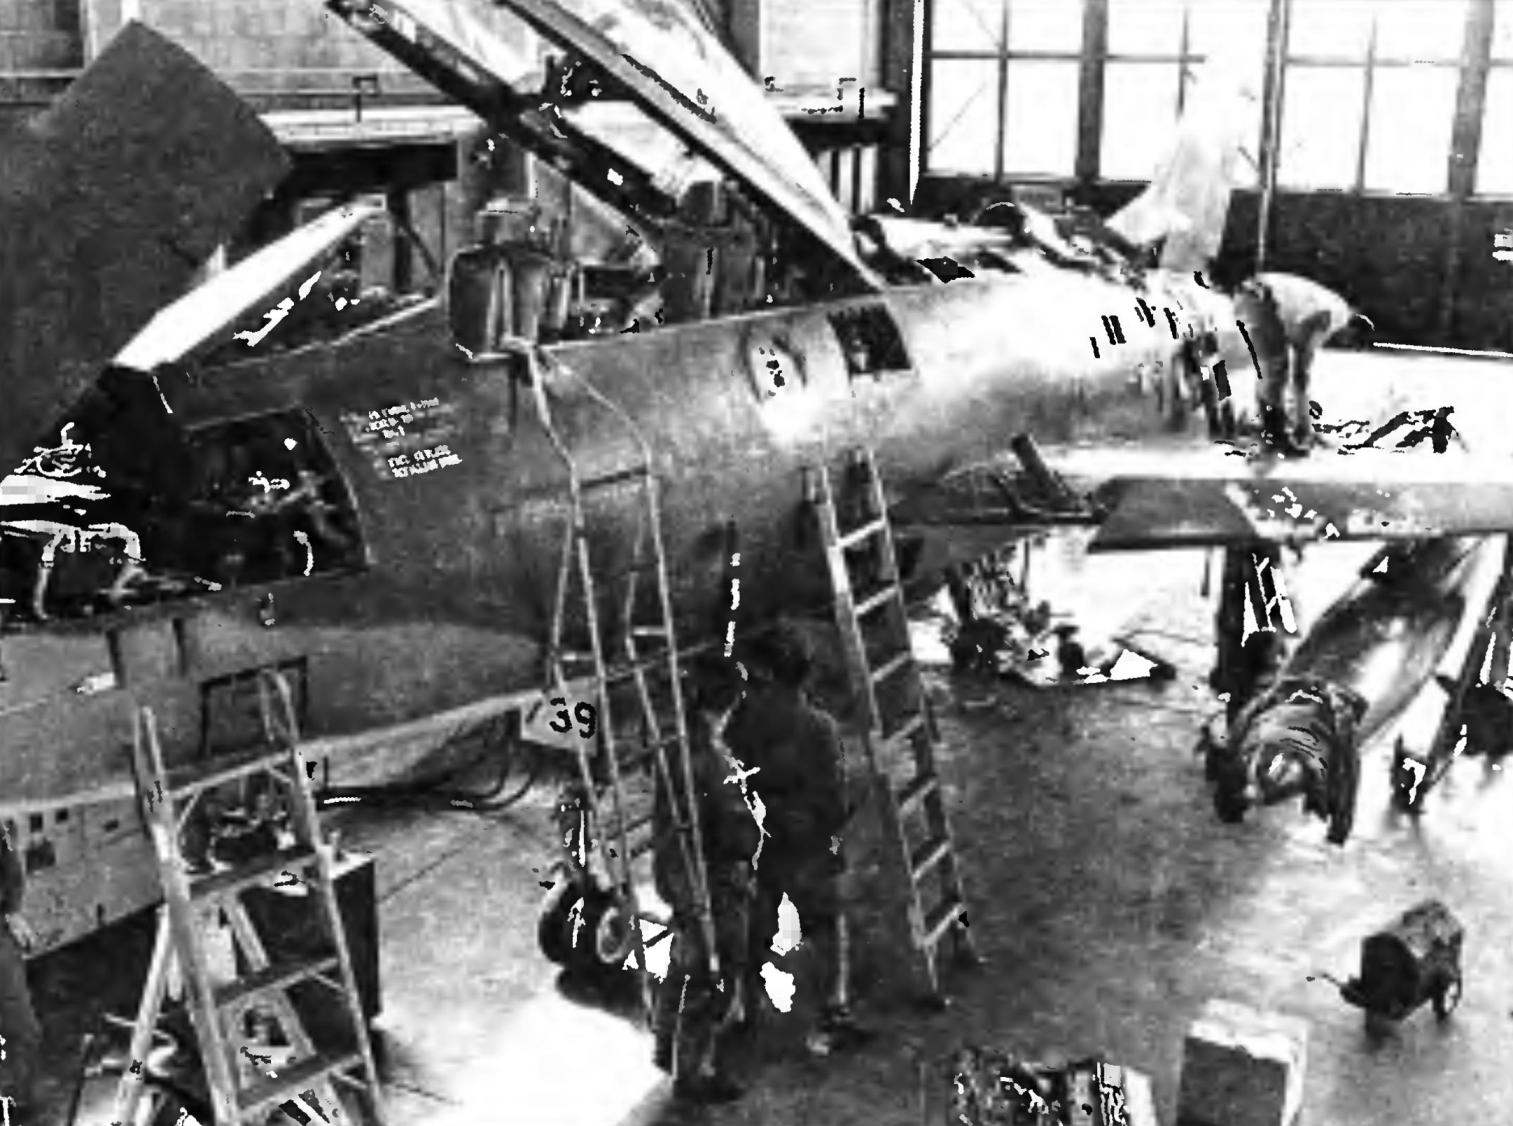 F-100D at regular work